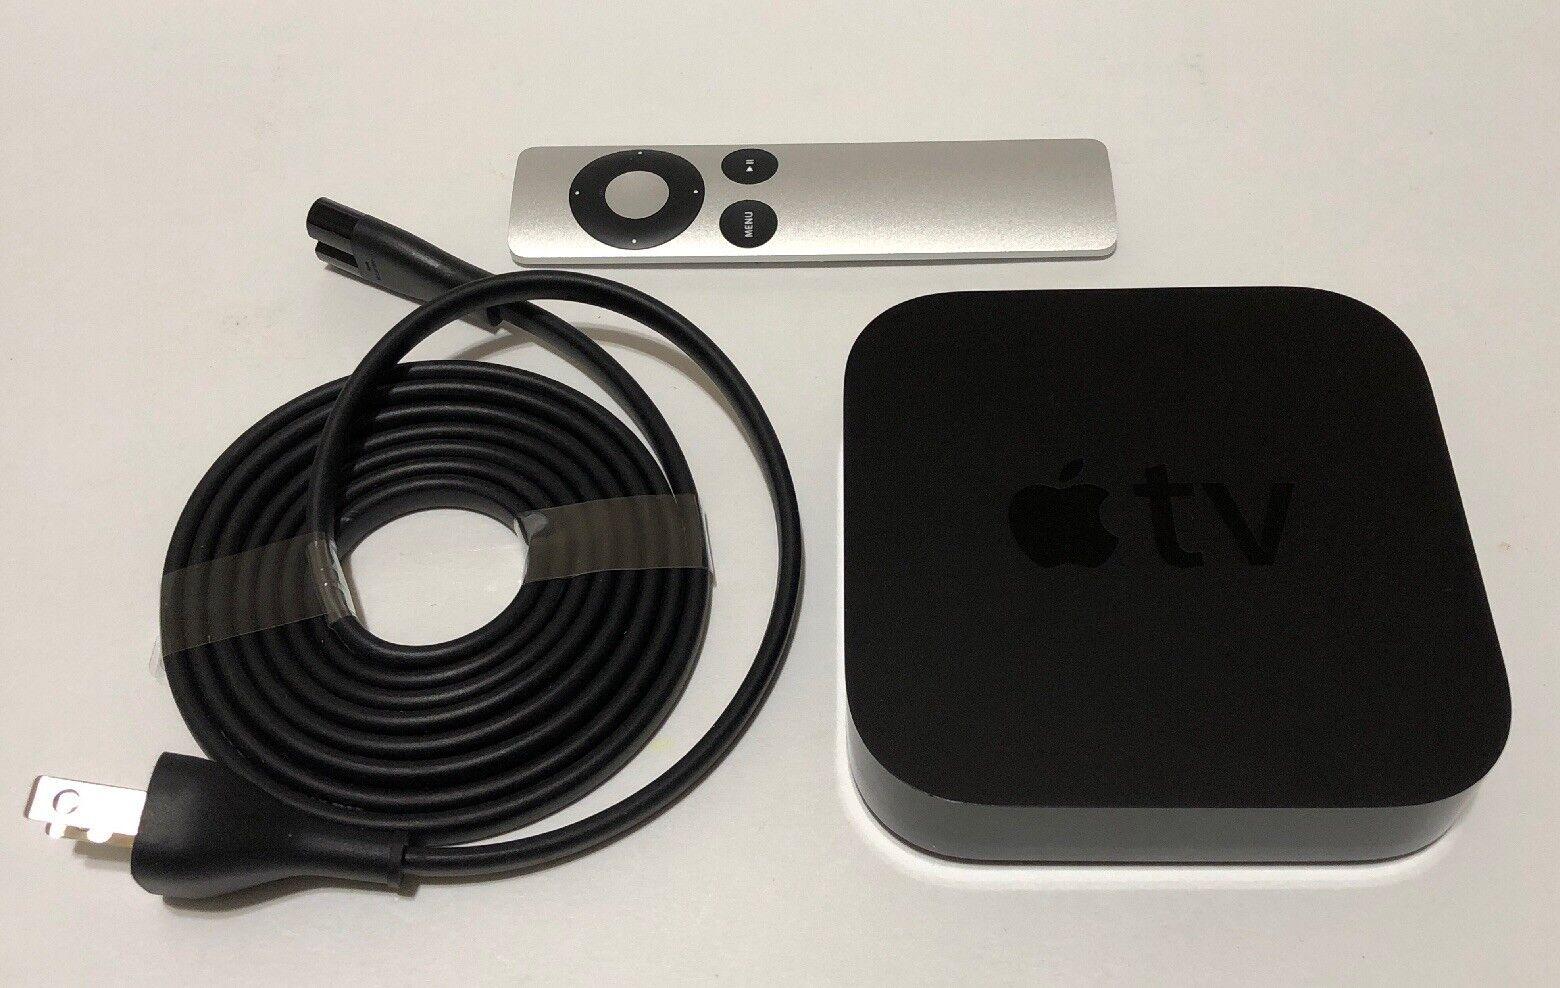 Apple TV (3rd Generation) Smart Media Streaming Player with original remote apple media original player remote smart streaming with